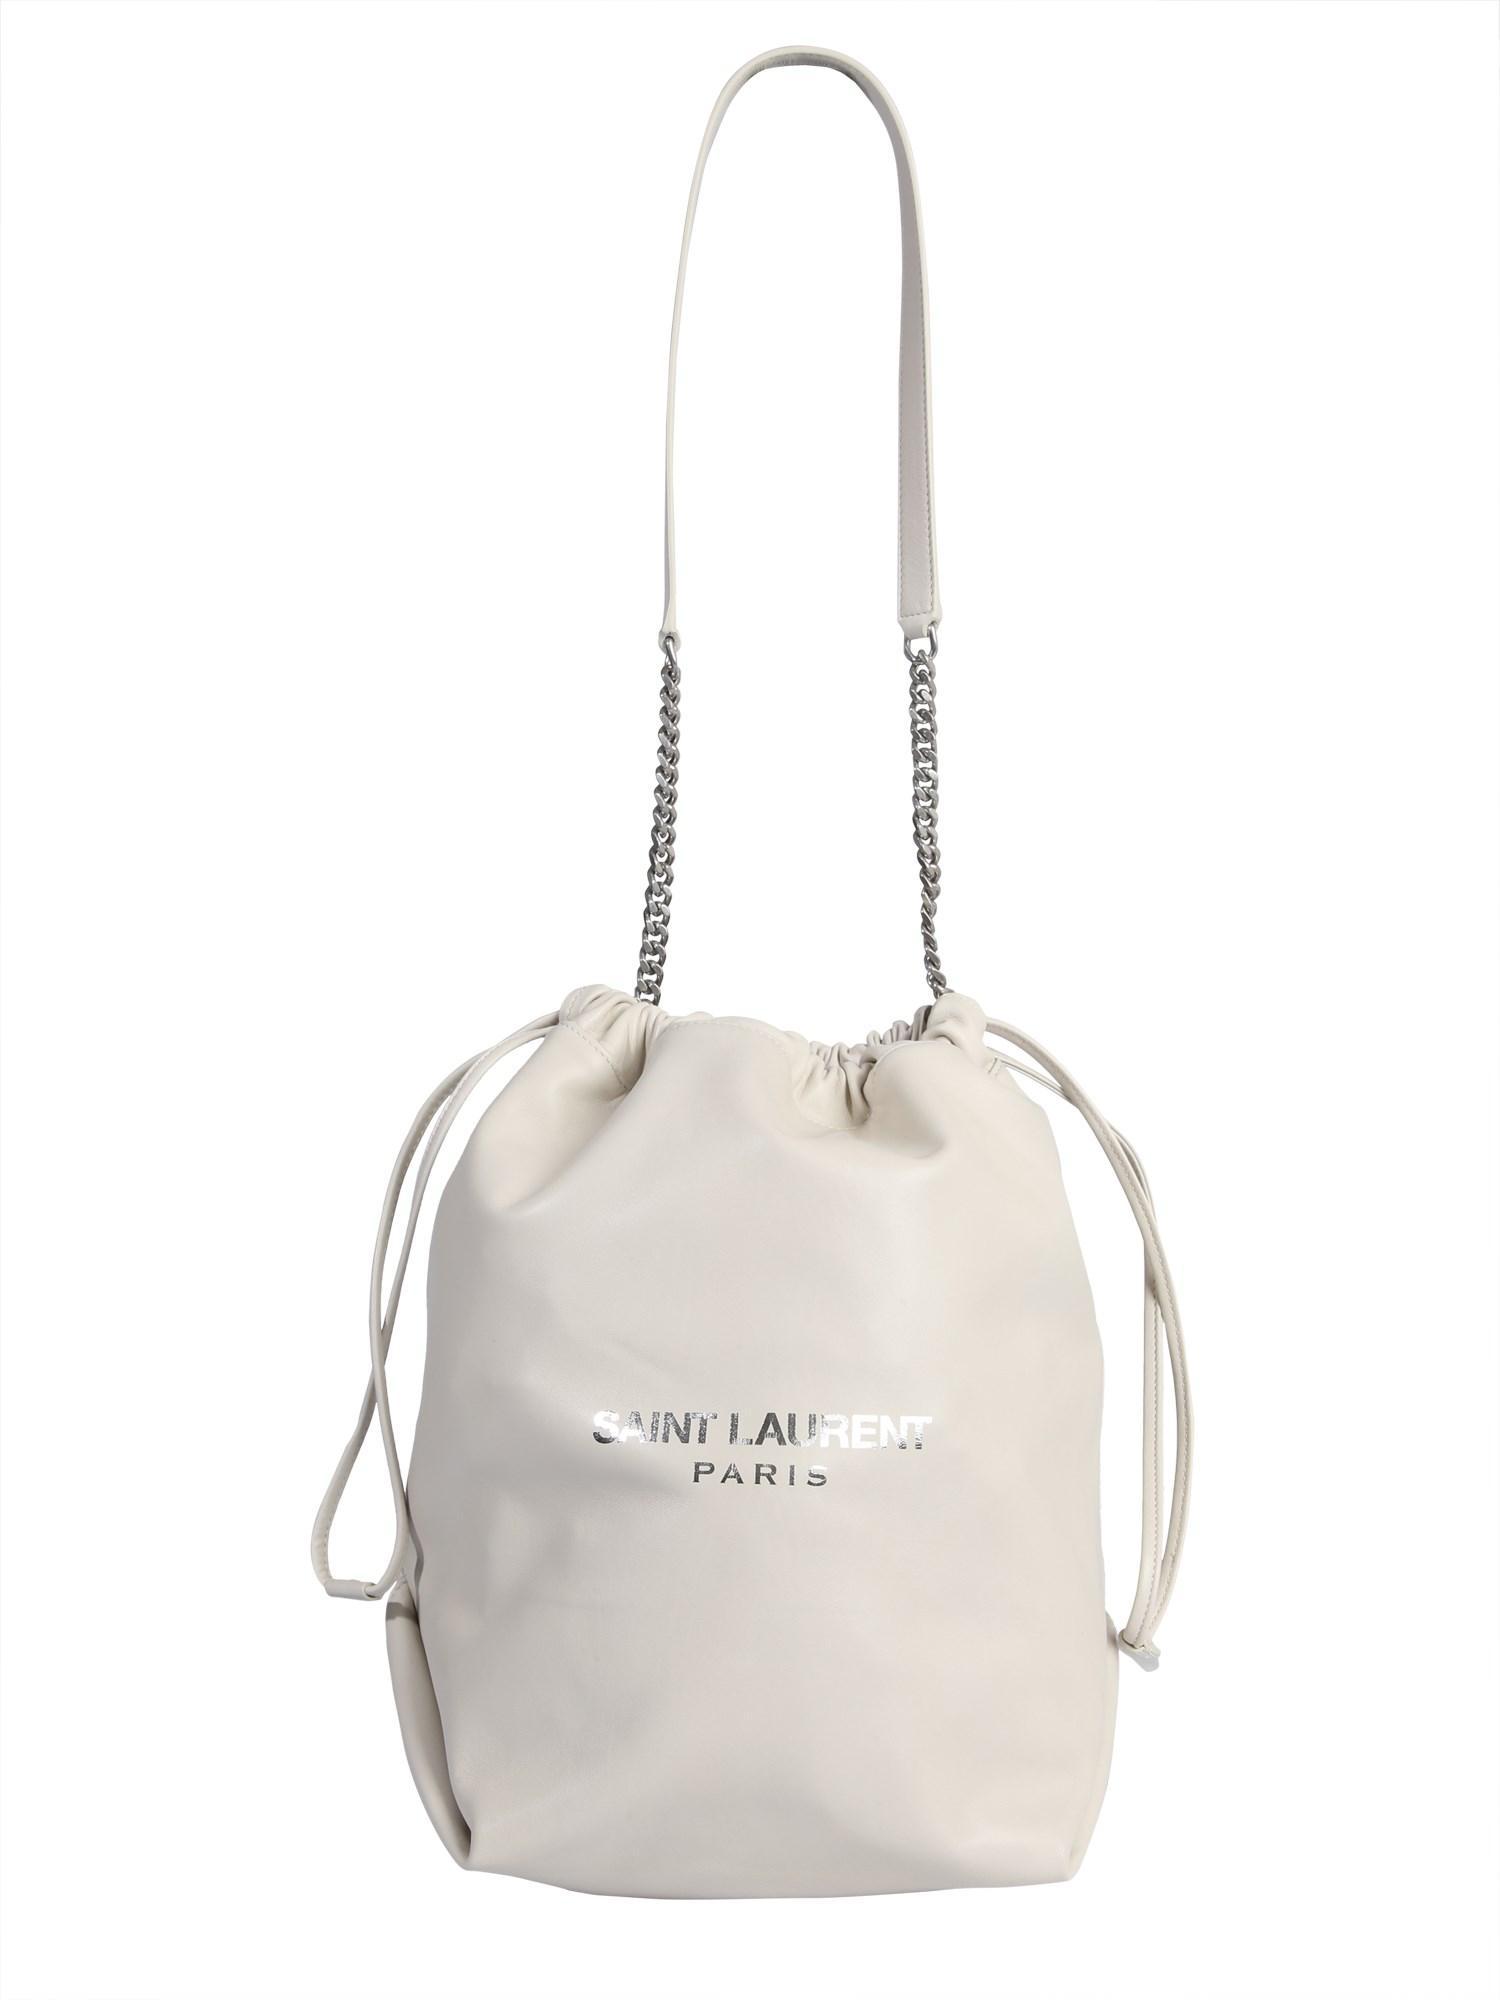 9121385606bda Lyst - Saint Laurent Teddy Leather Bag in White